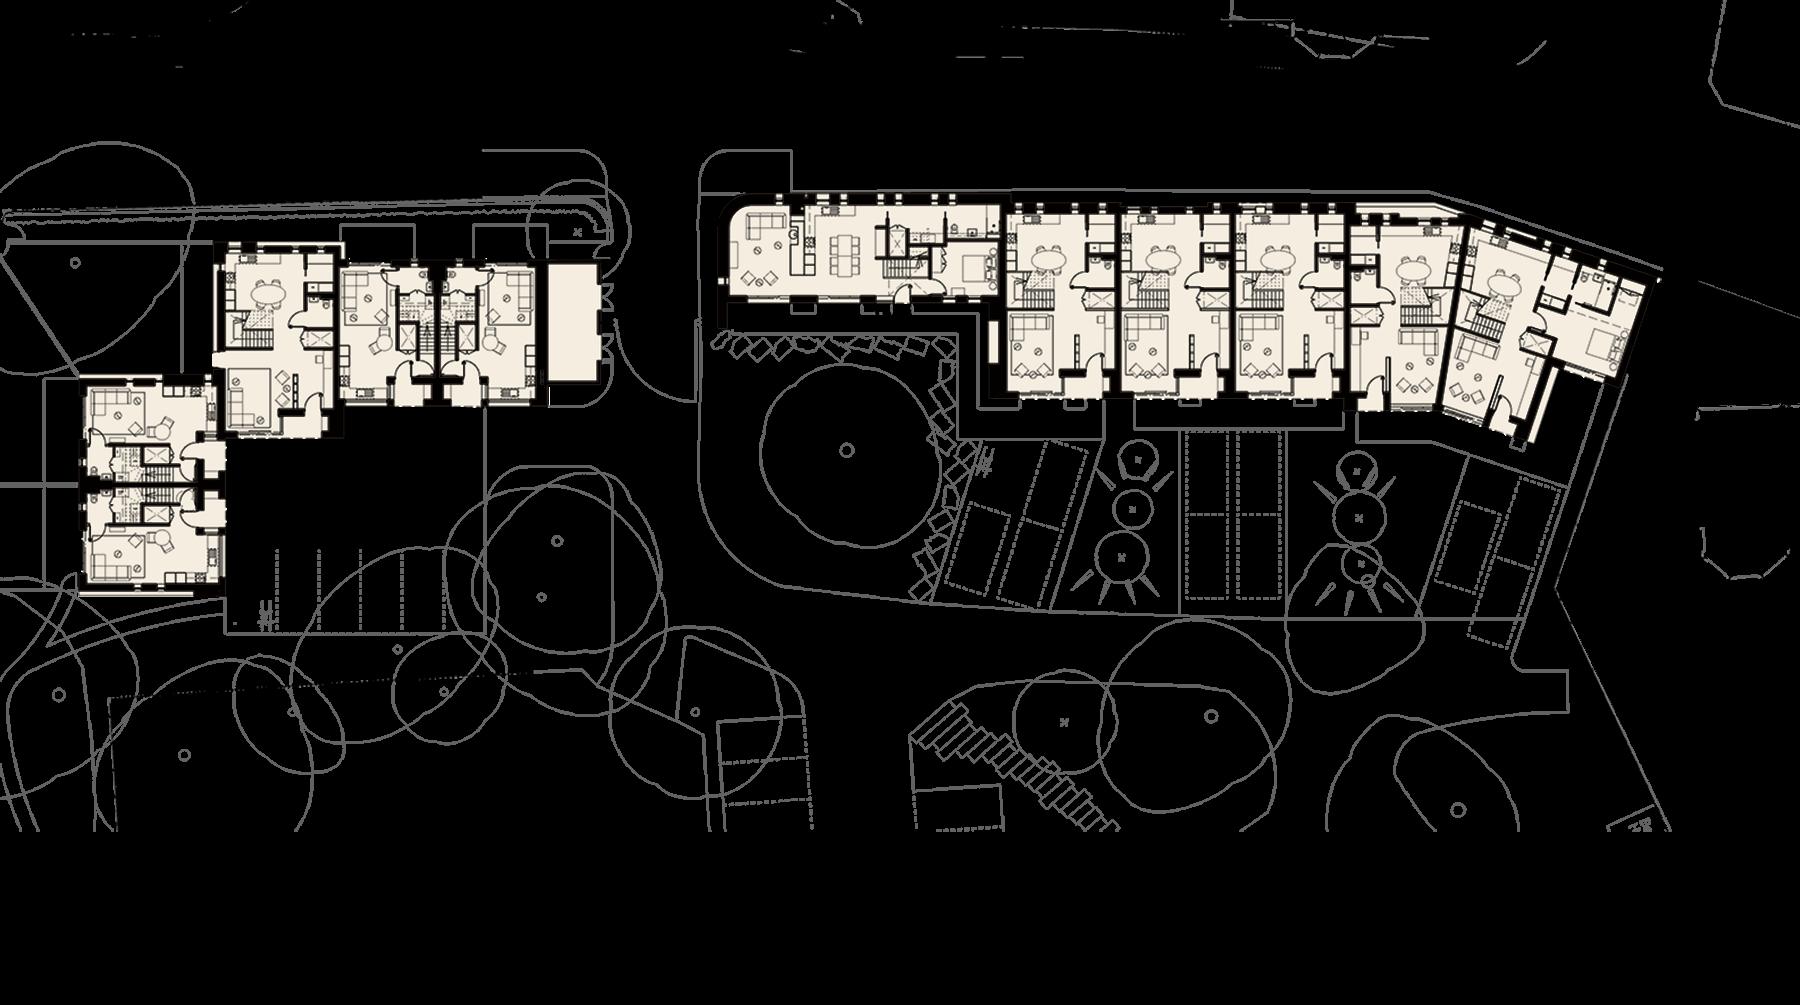 Sarah-Wigglesworth-Architects Shell-Cove-IC Plan 1800